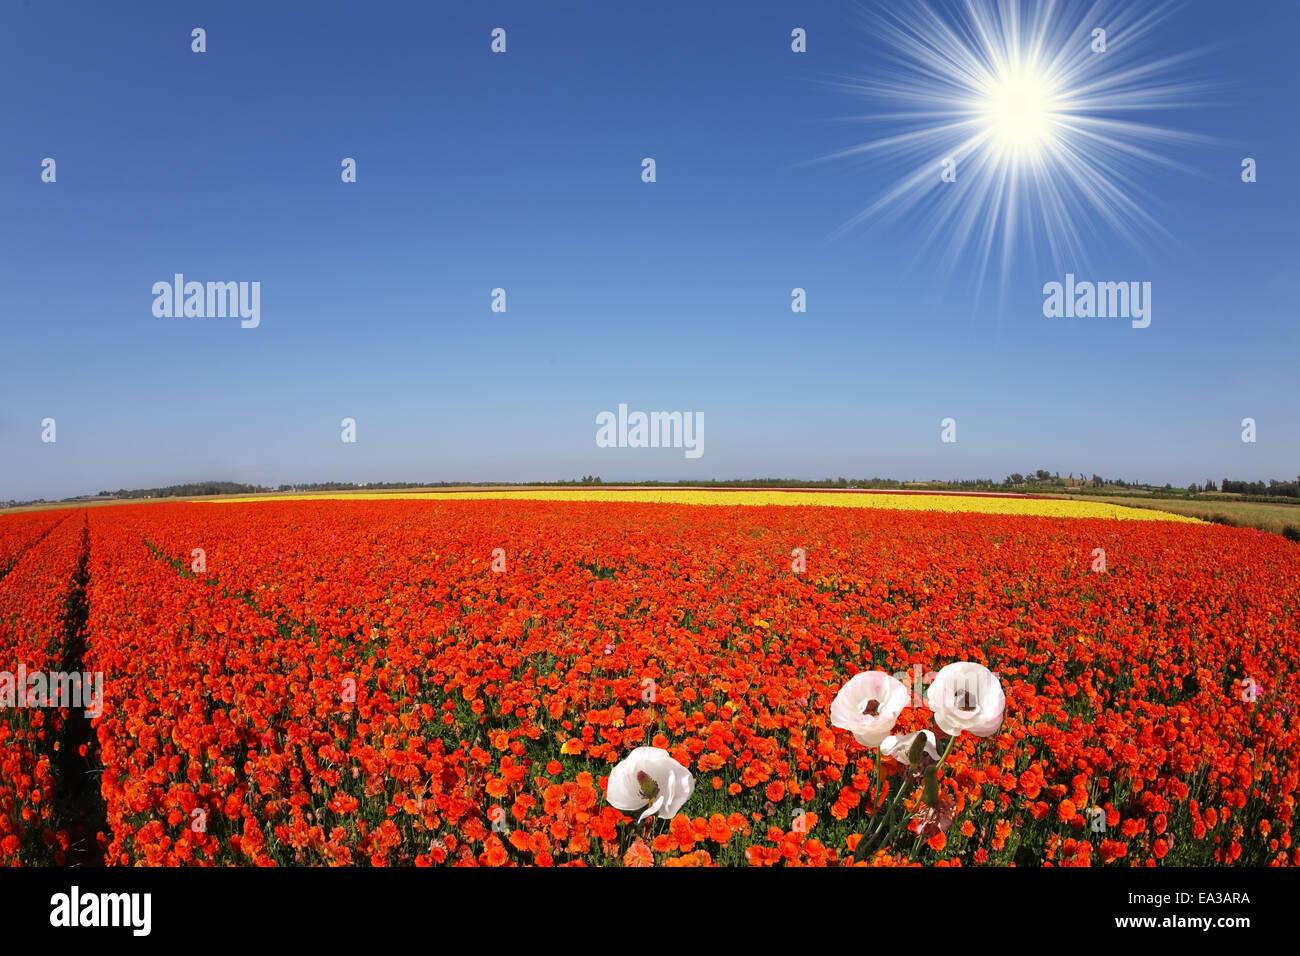 Toy bright sun shines - Stock Image